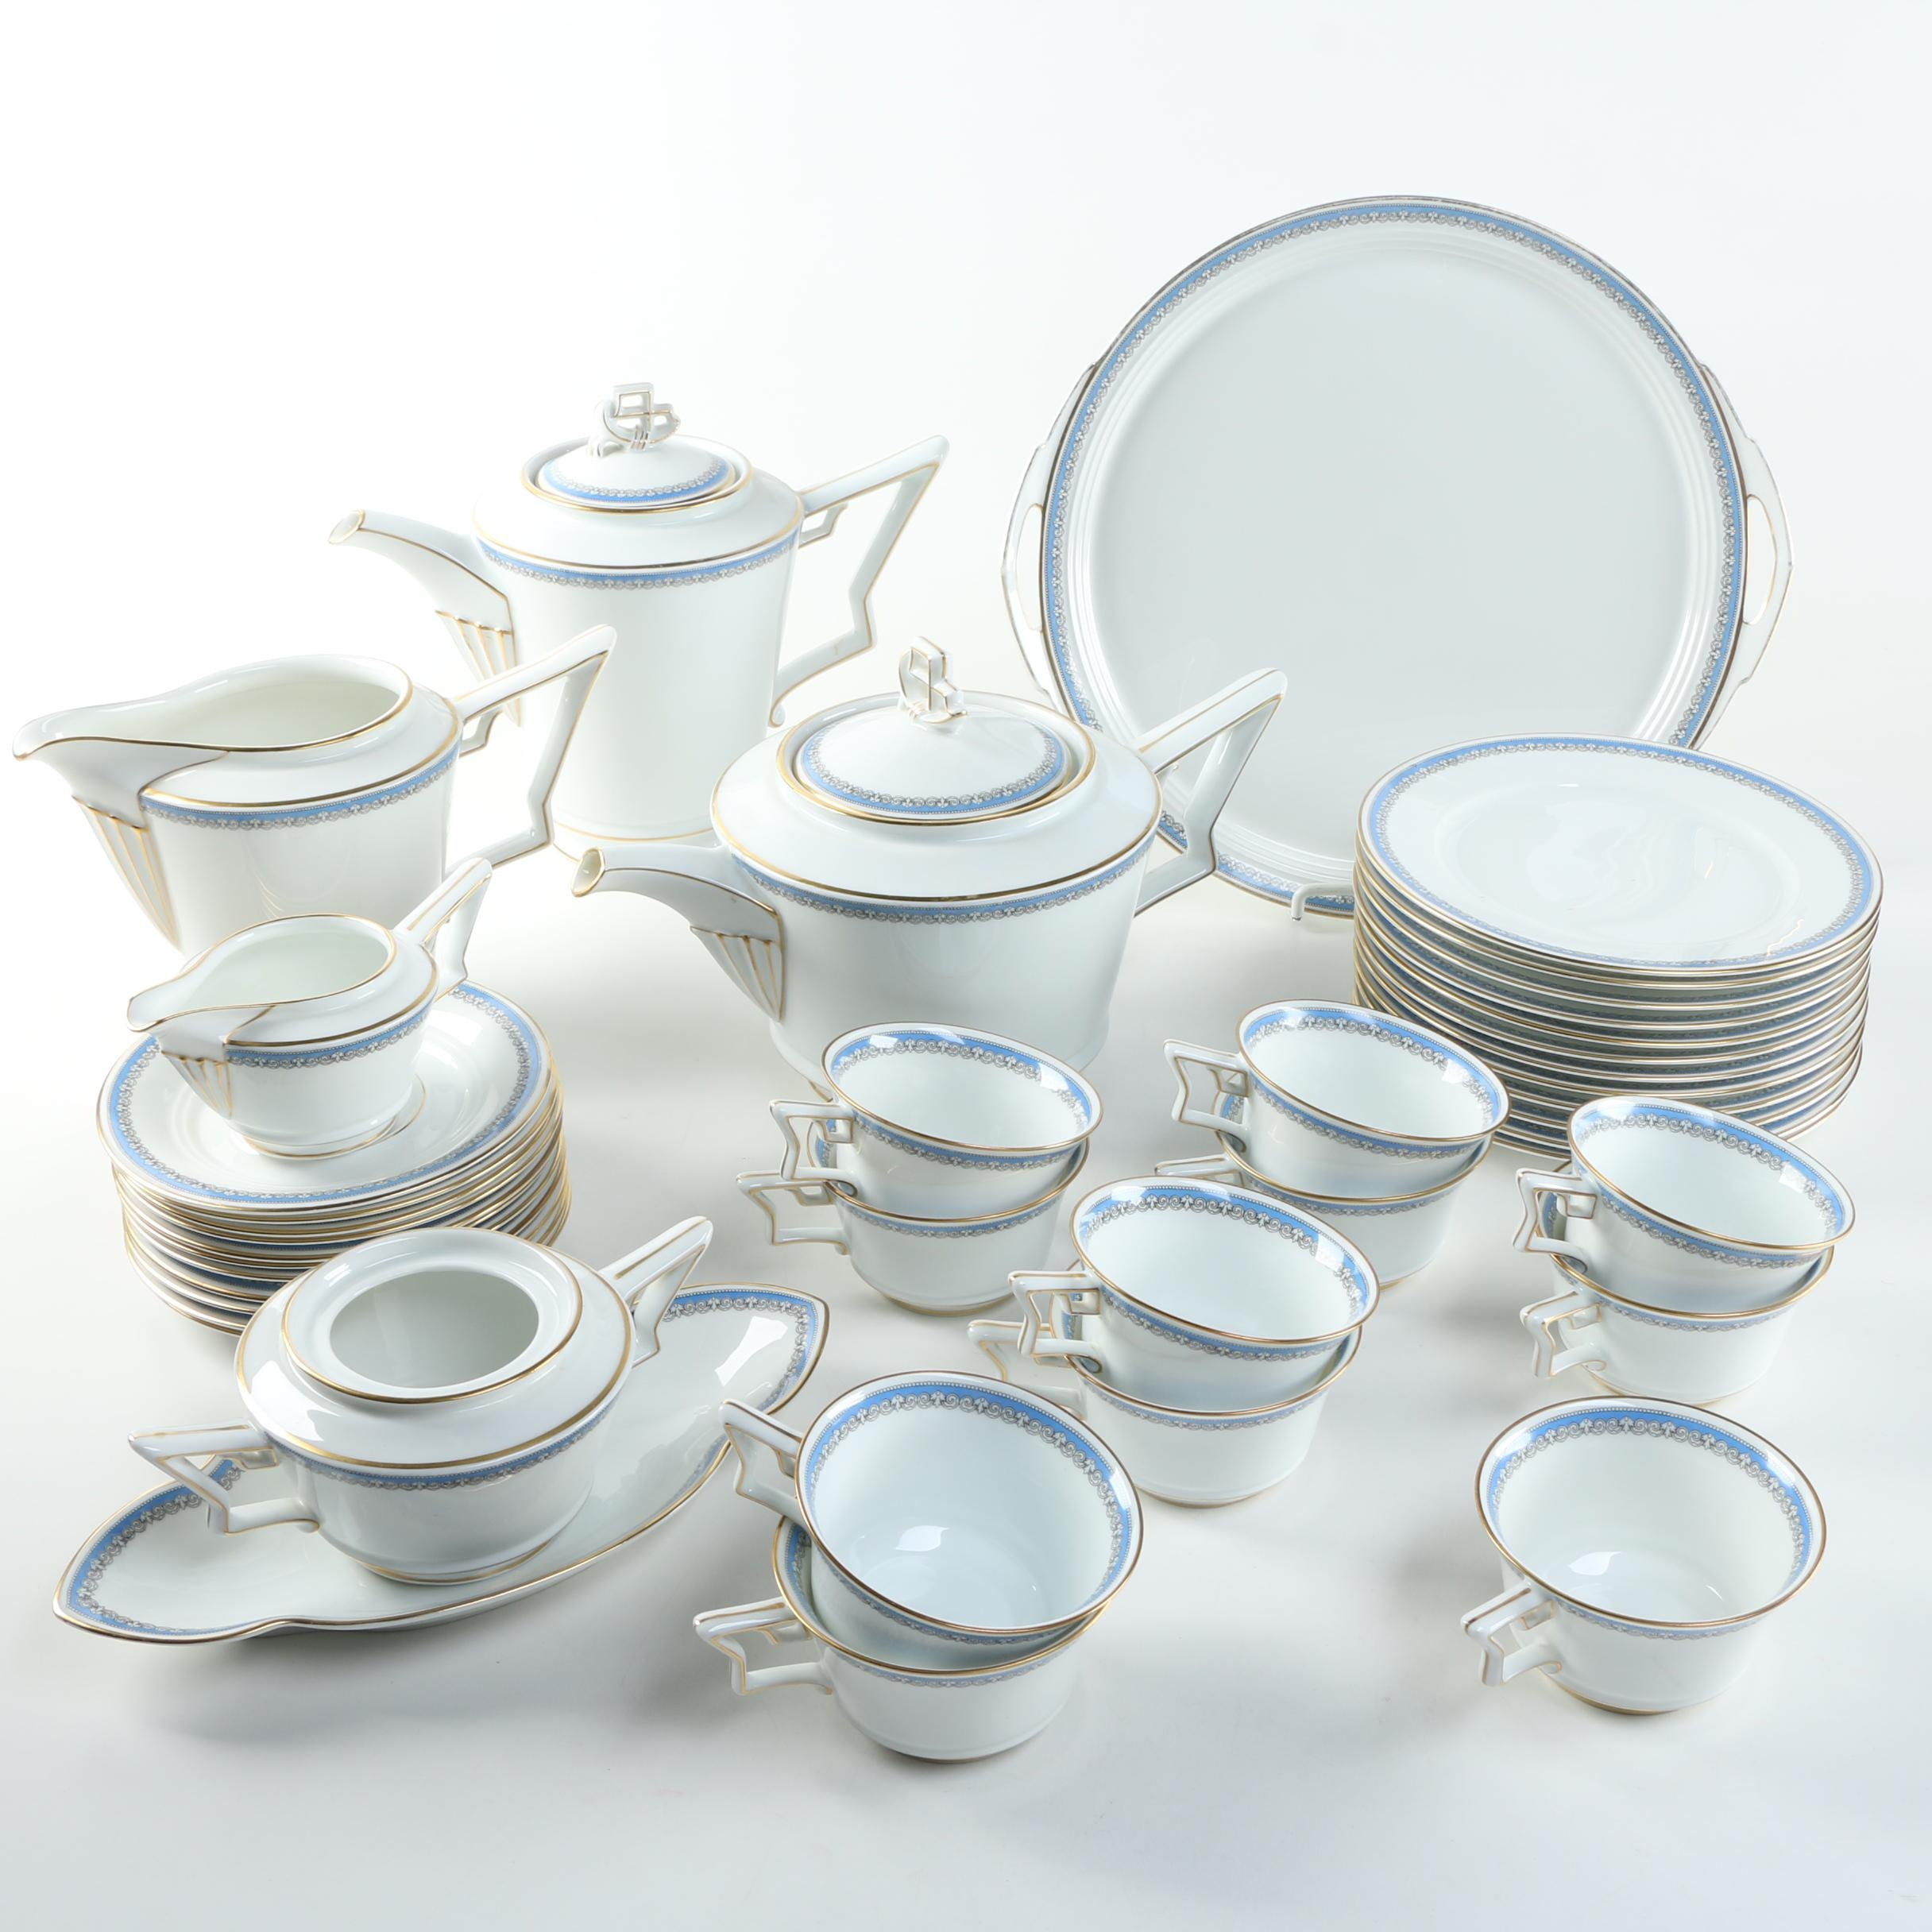 Rosenthal  Tirana  Porcelain Tableware ... & Rosenthal